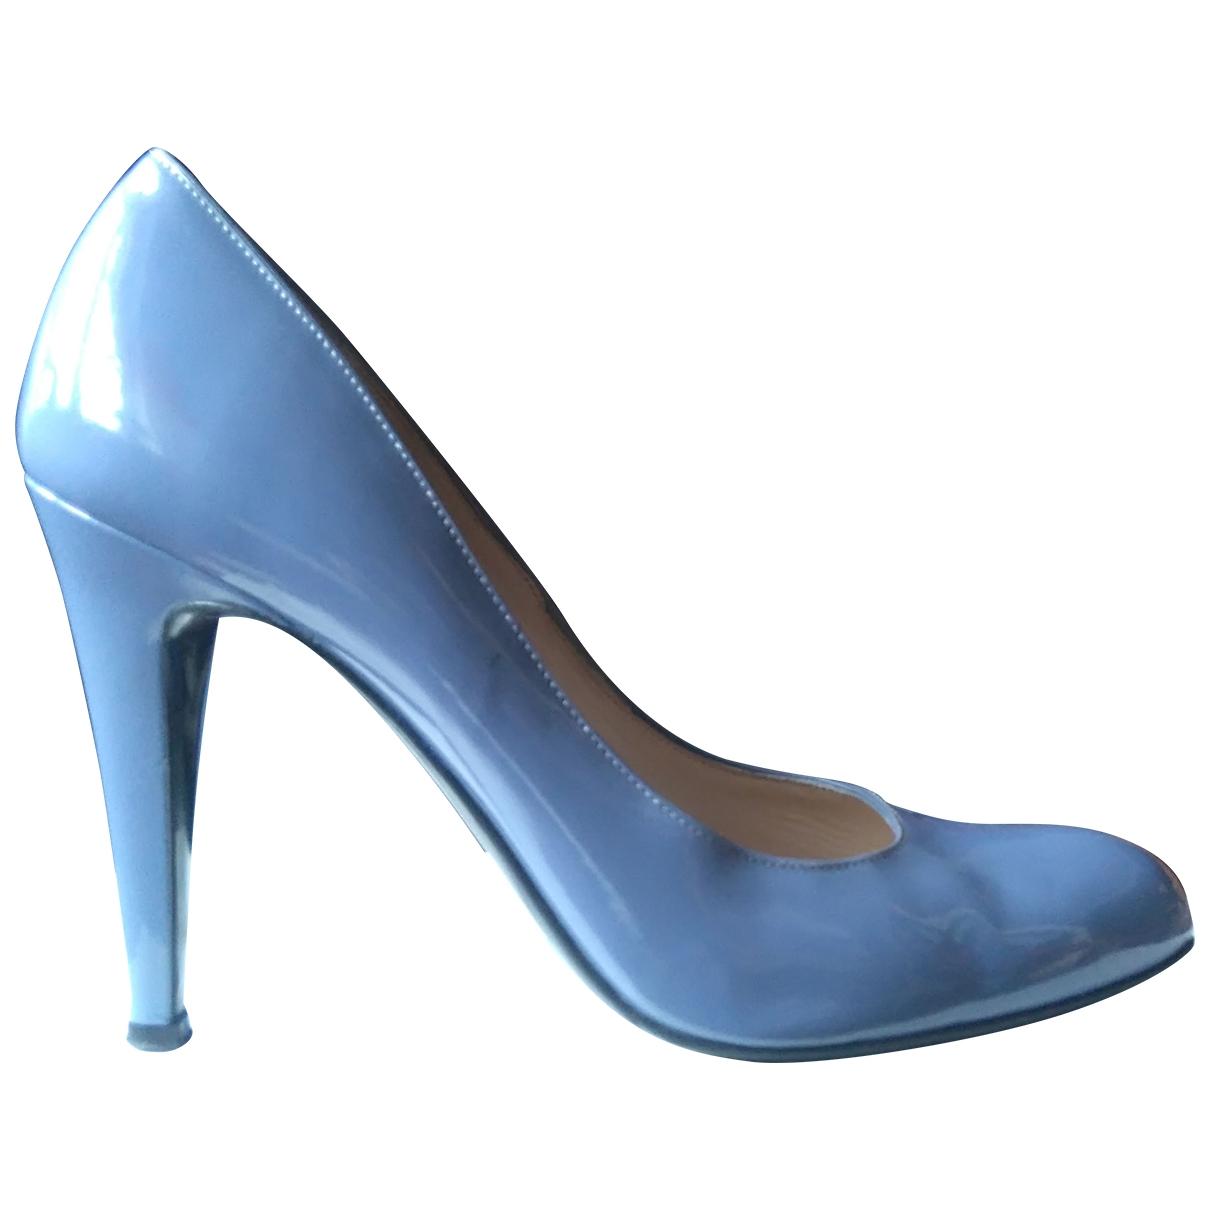 Bally - Escarpins   pour femme en cuir verni - bleu